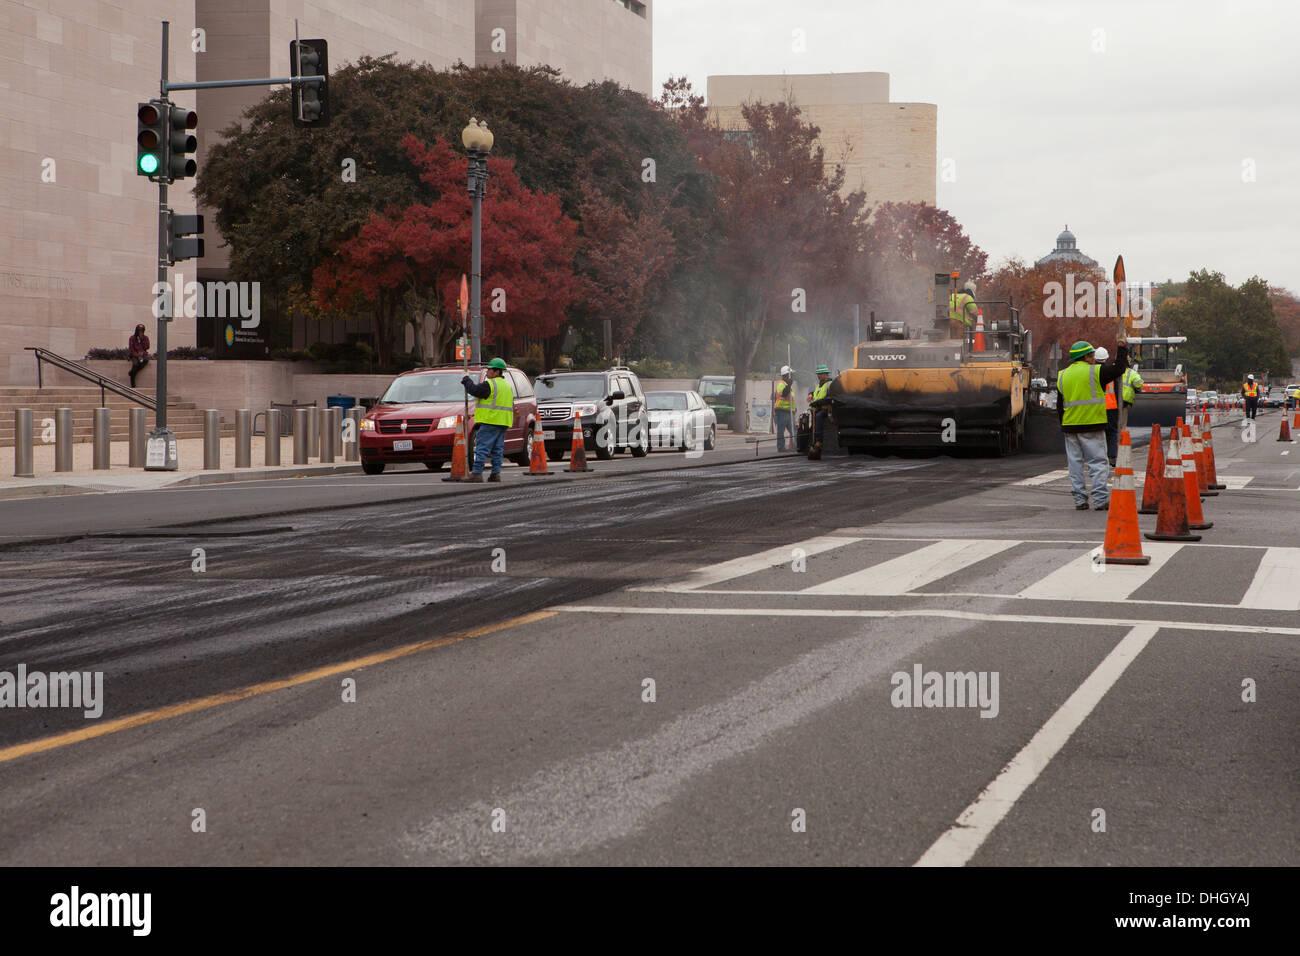 Asphalt road resurfacing crew at work - Washington, DC USA - Stock Image